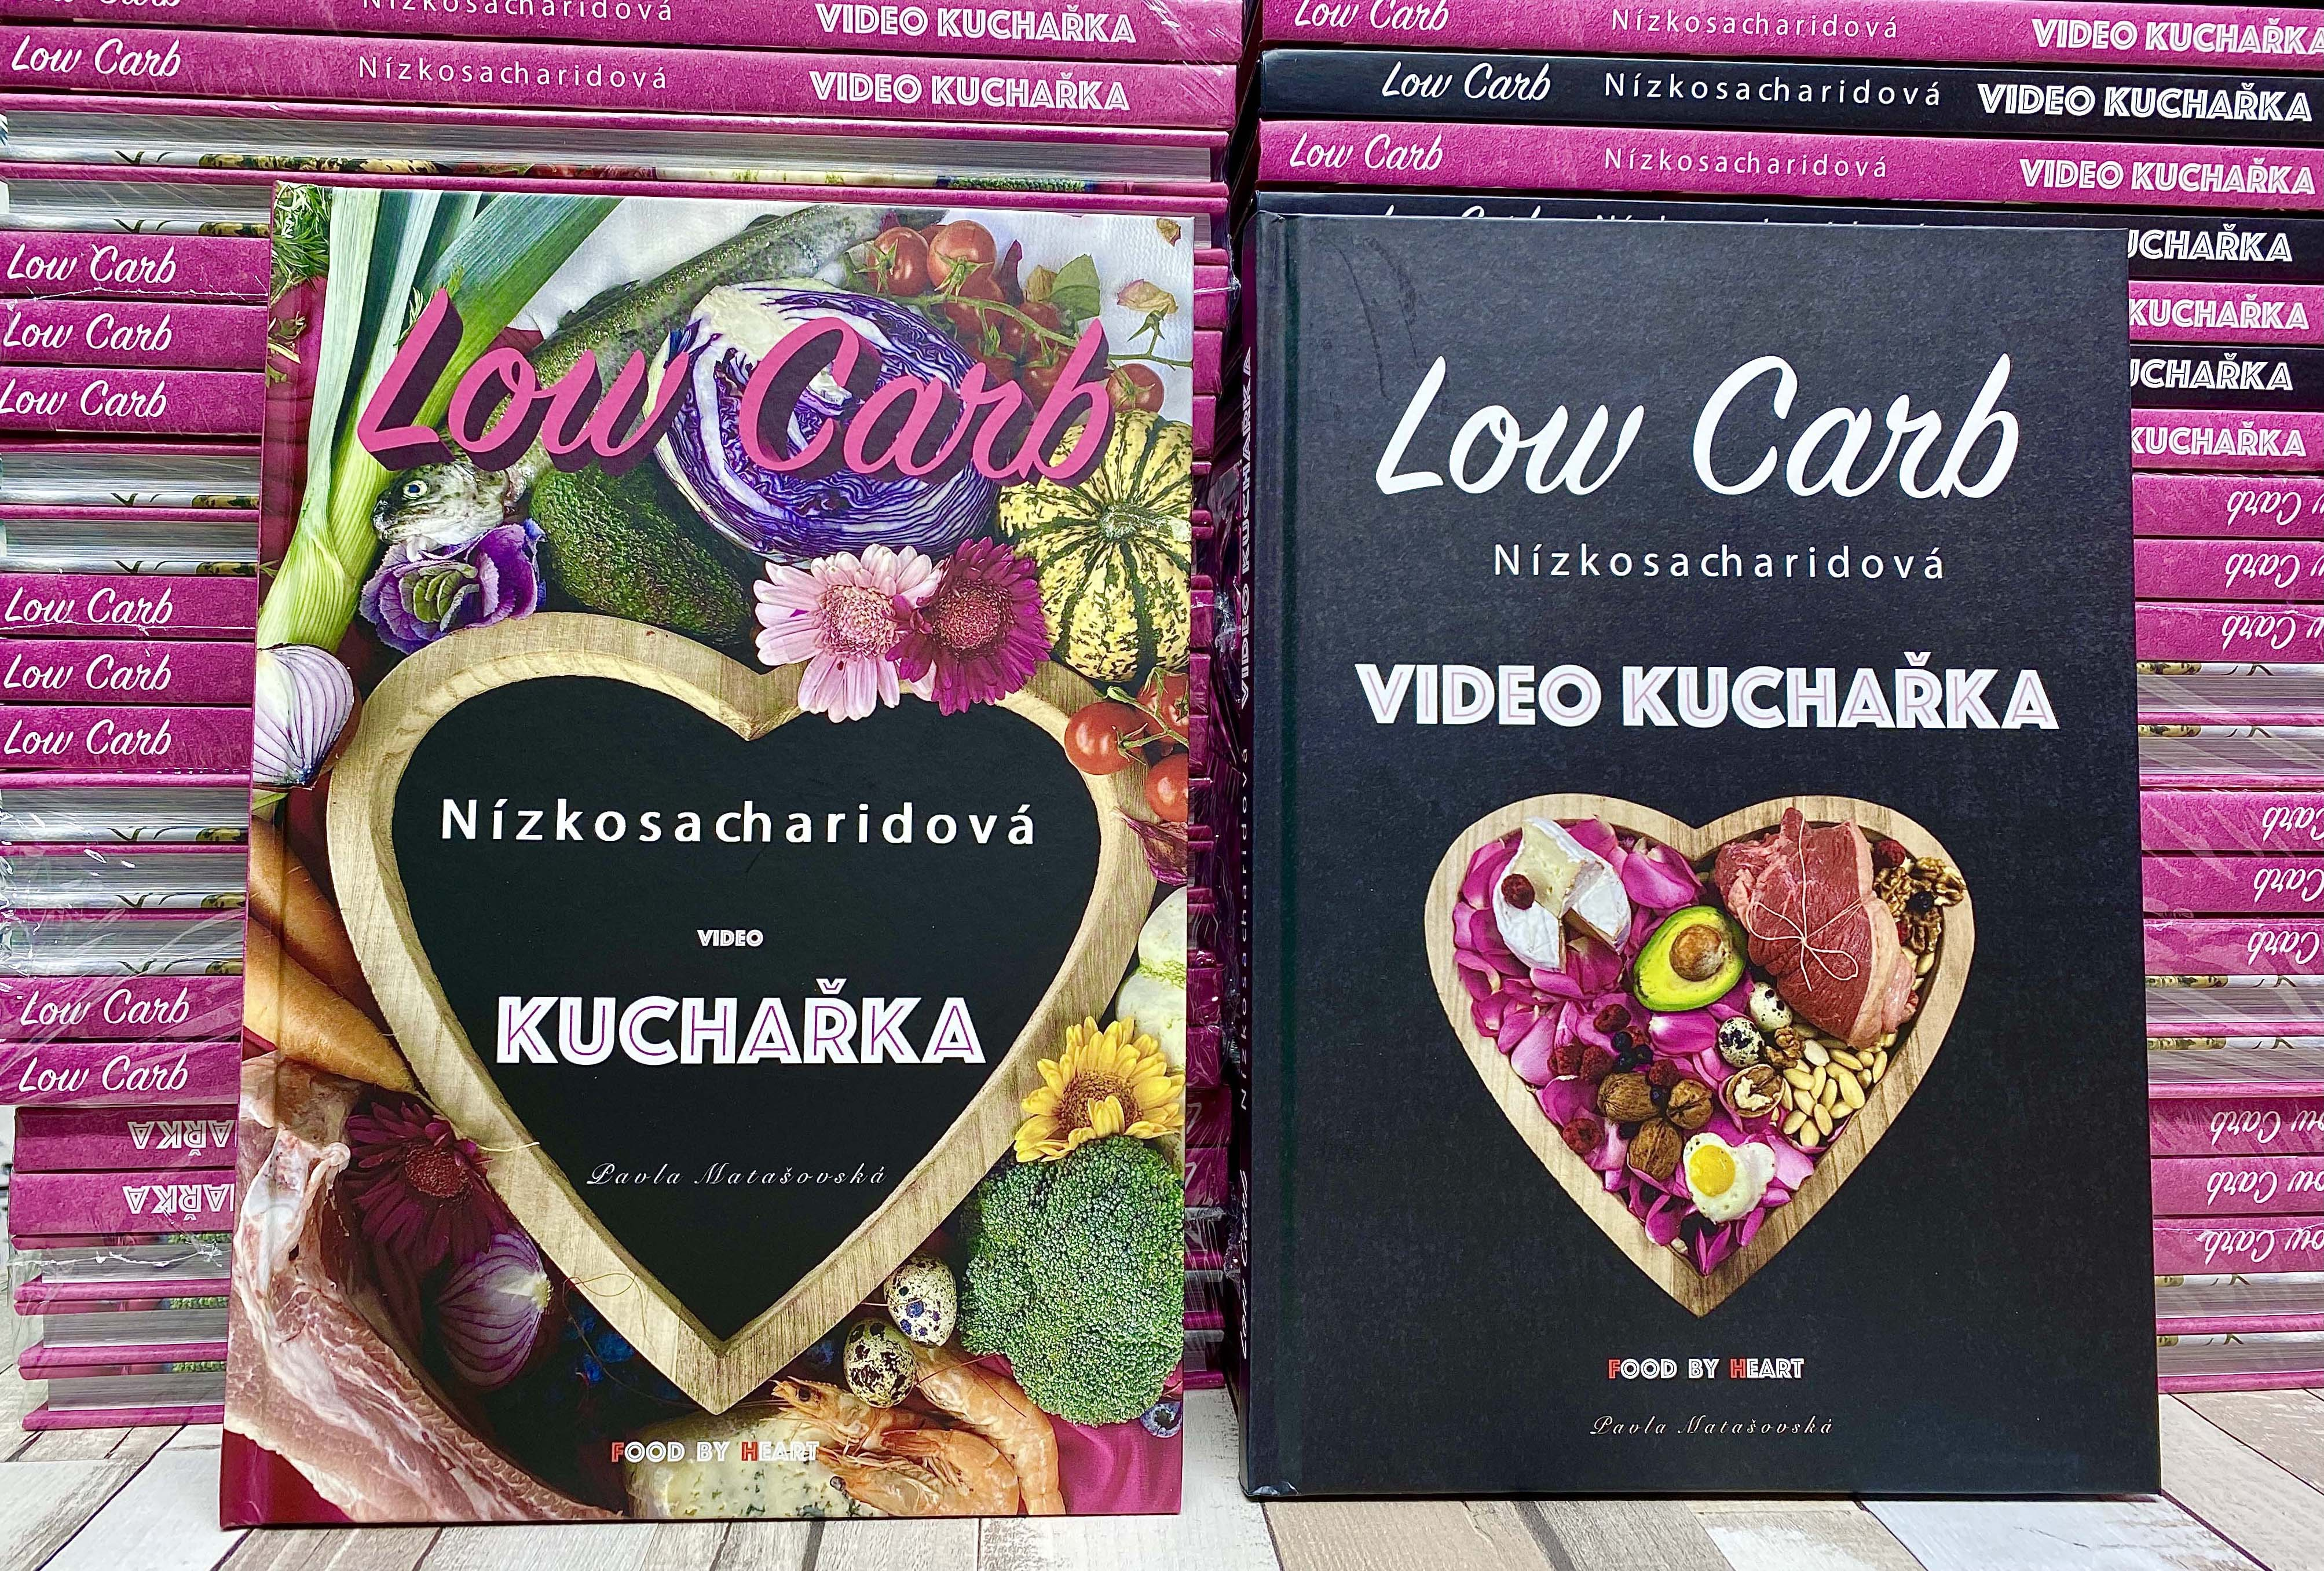 Low Carb Kucharka